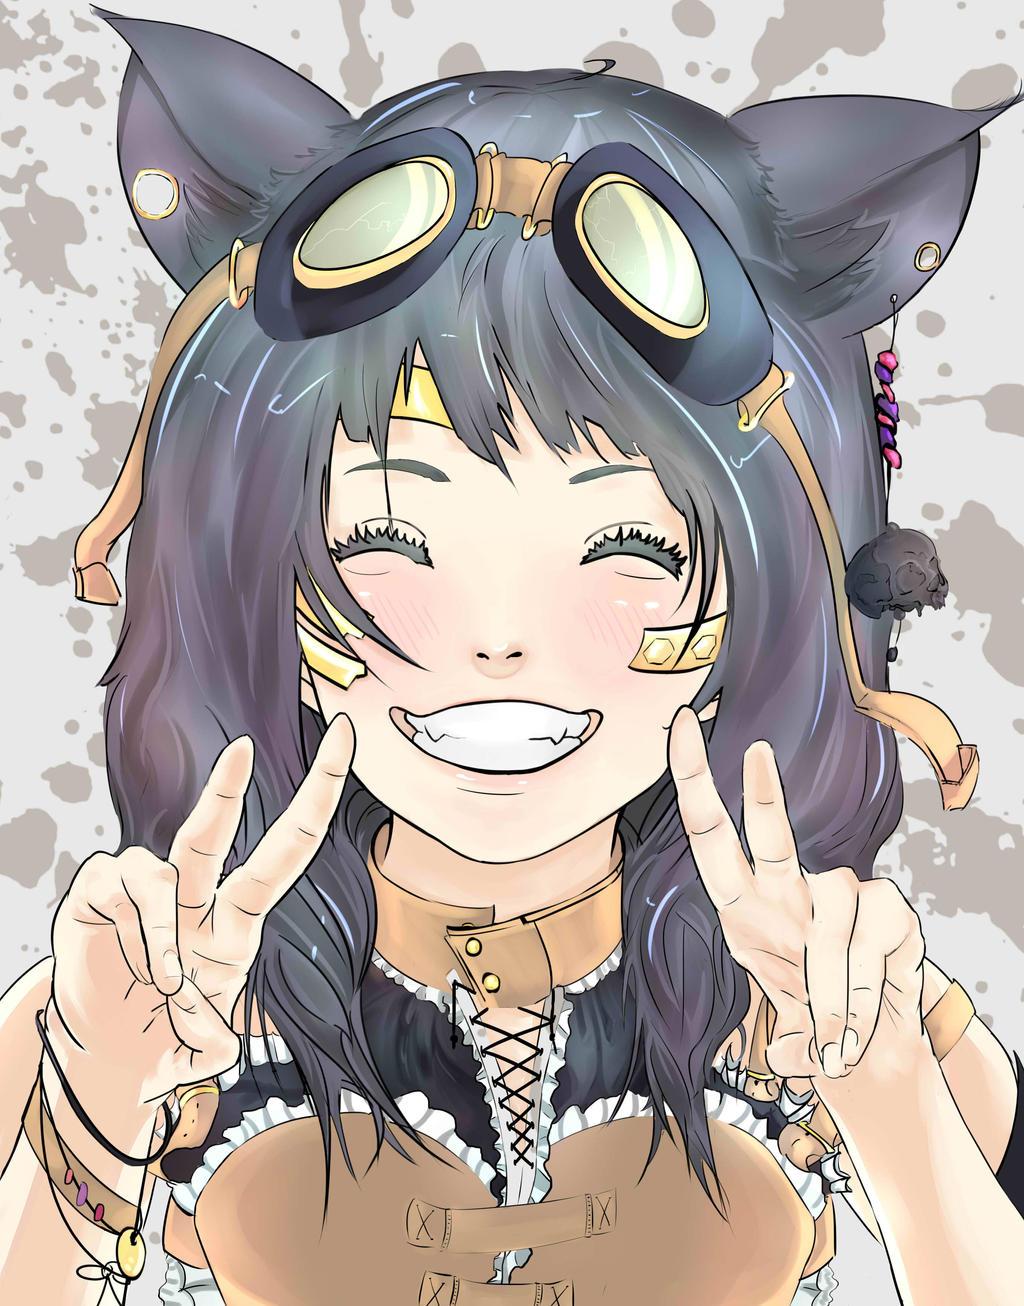 steampunk anime girl color by diehardpizzalover on